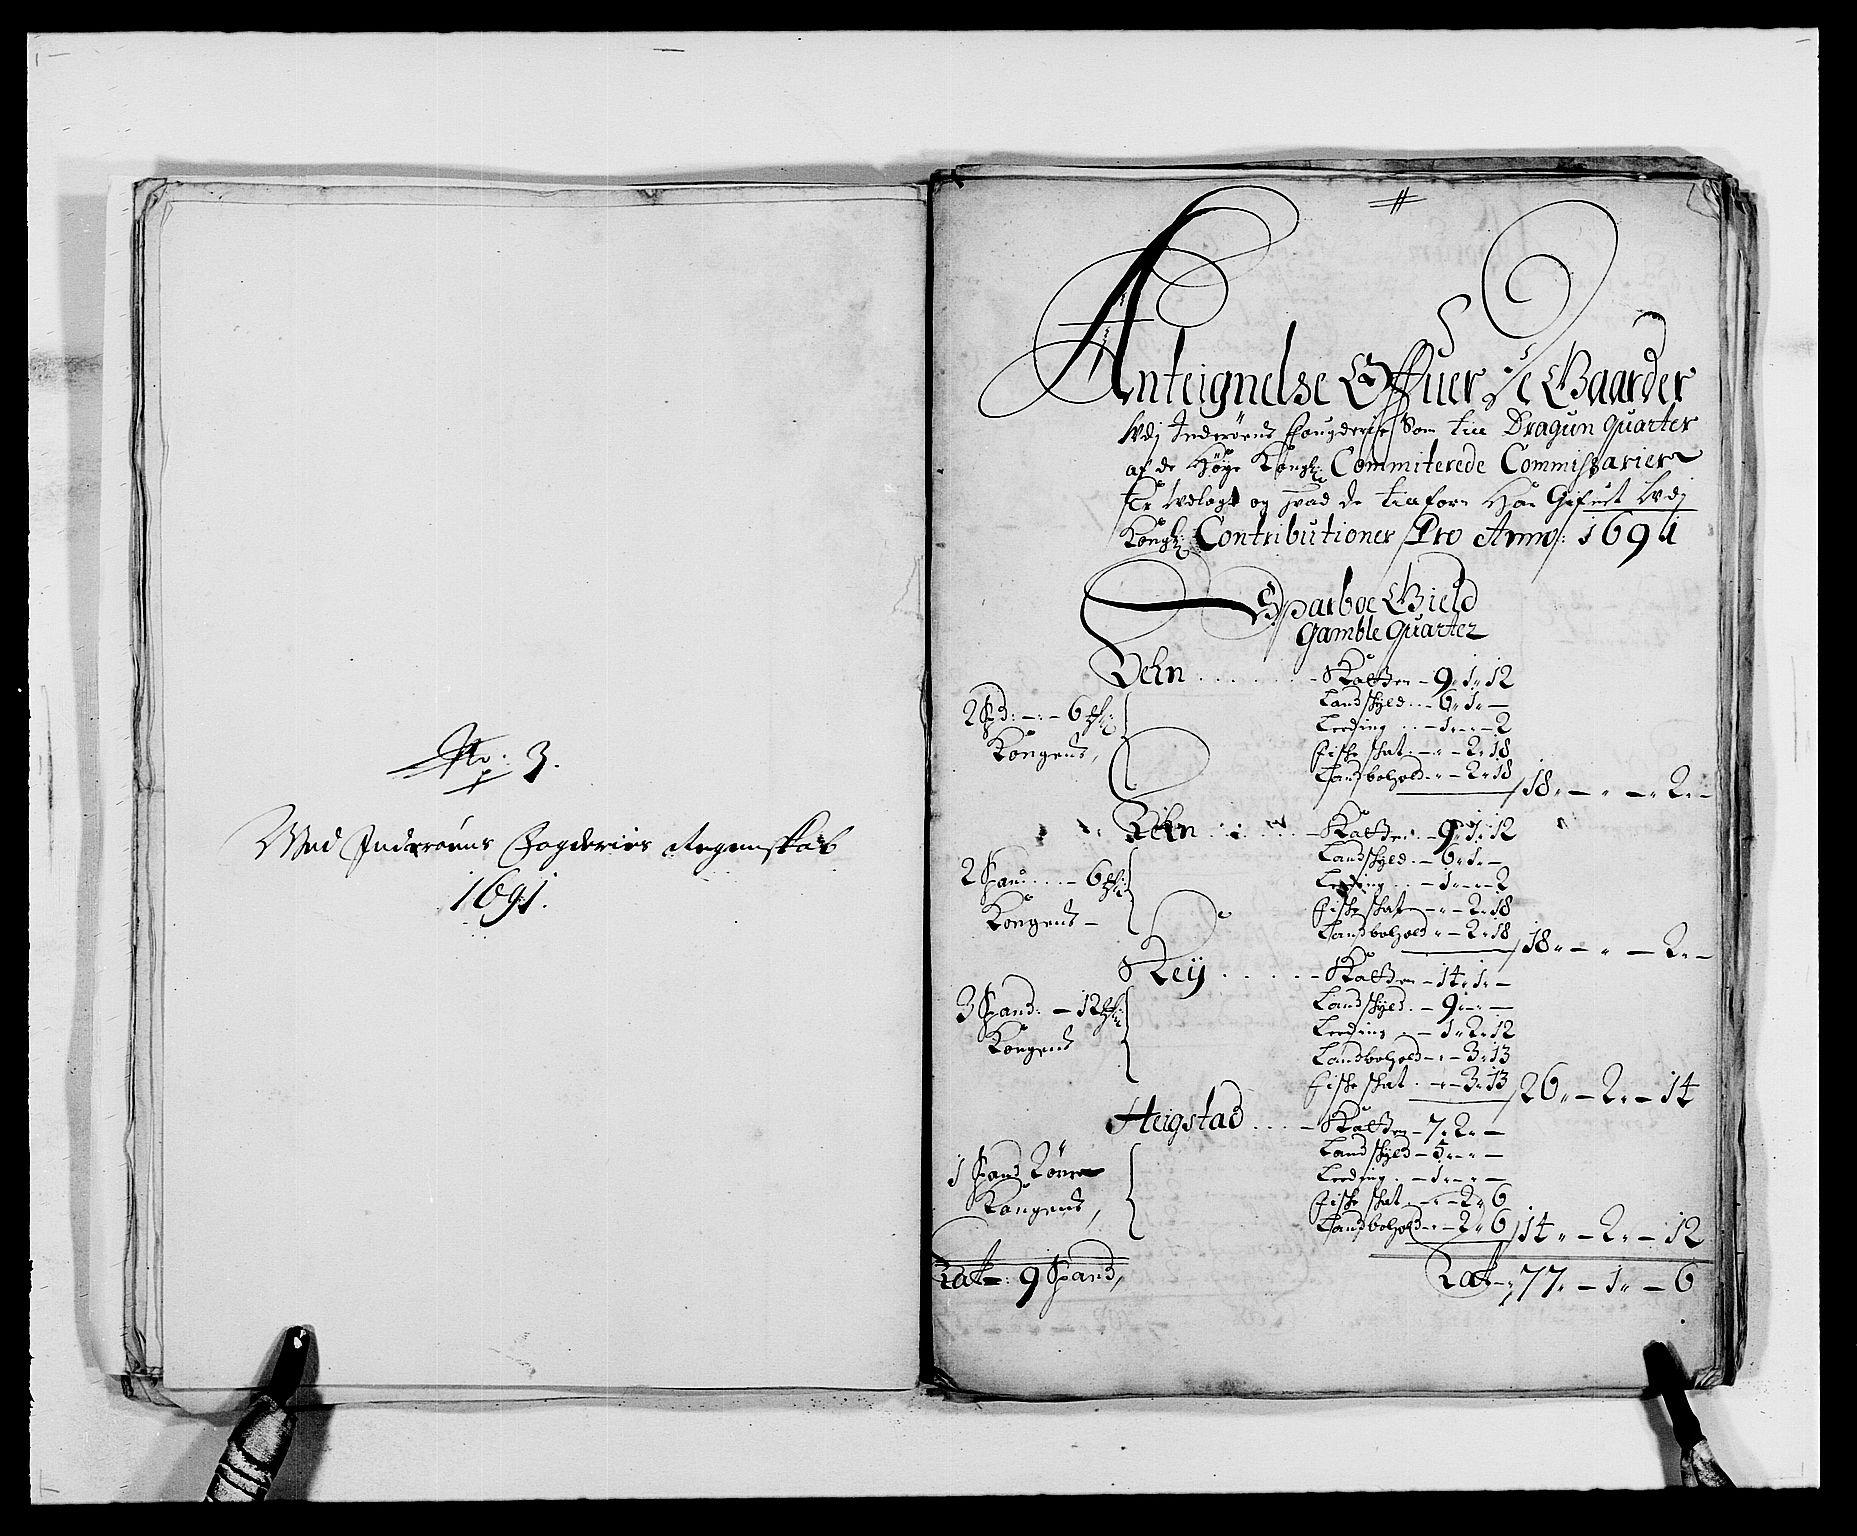 RA, Rentekammeret inntil 1814, Reviderte regnskaper, Fogderegnskap, R63/L4307: Fogderegnskap Inderøy, 1690-1691, s. 421